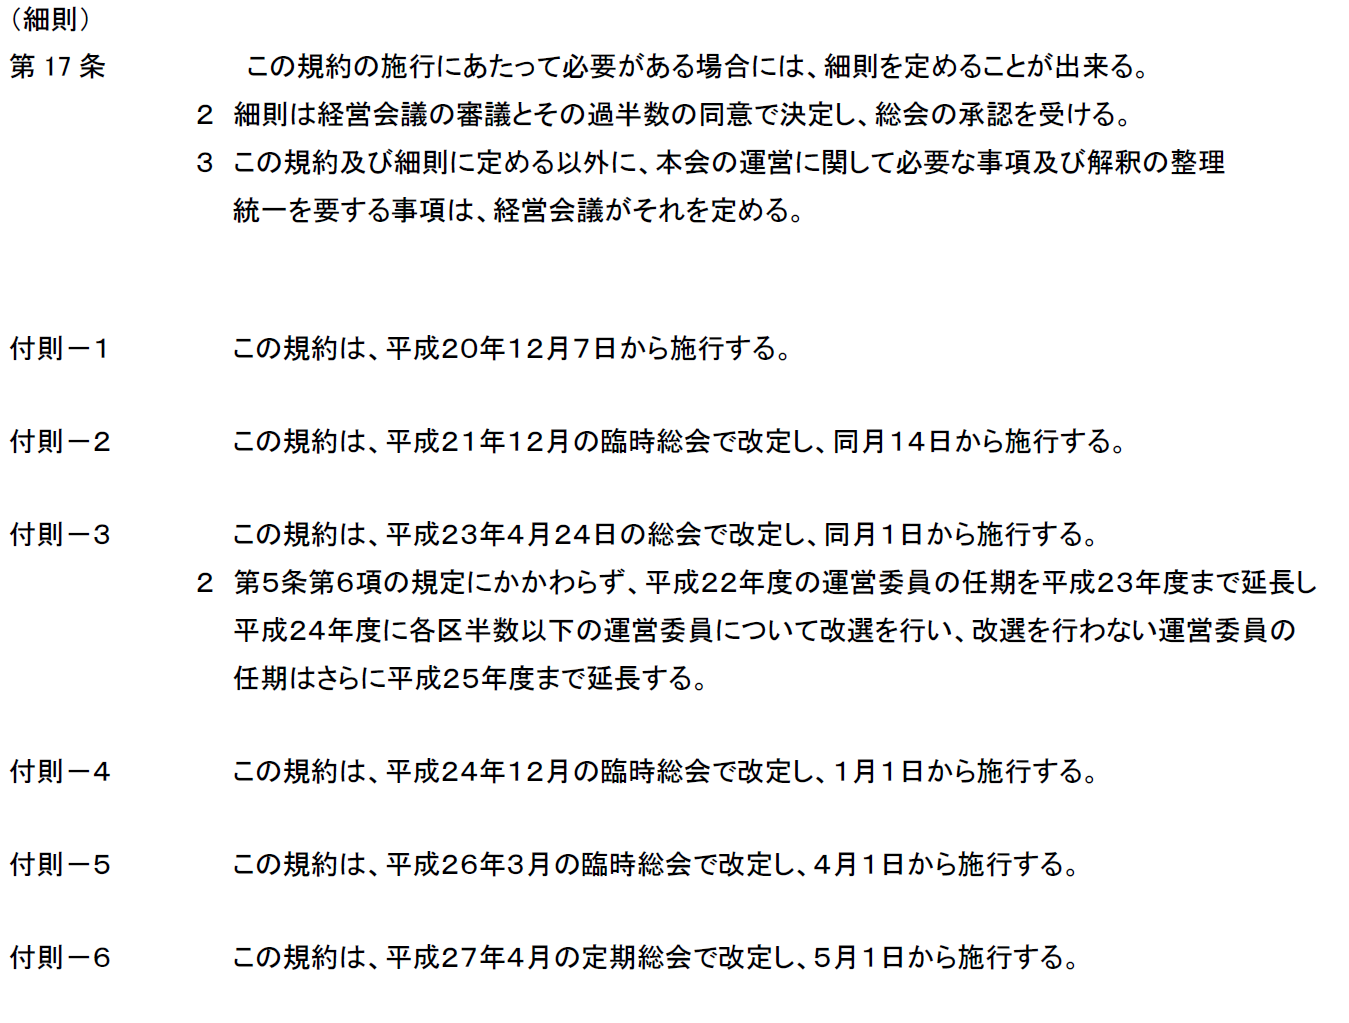 kiyaku20150501-4